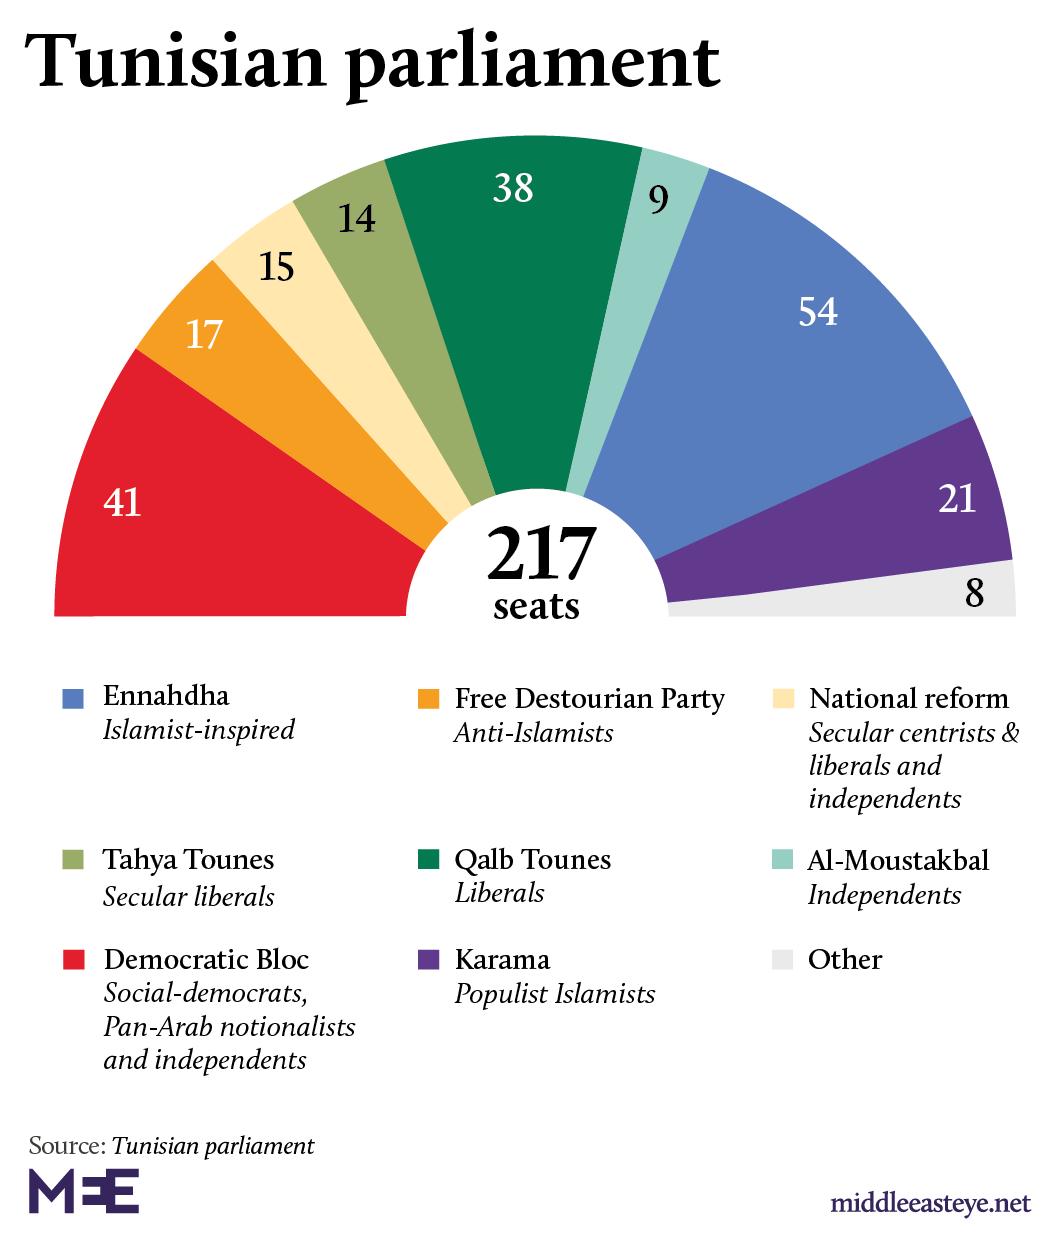 Tunisia parliament: Breakdown of seats